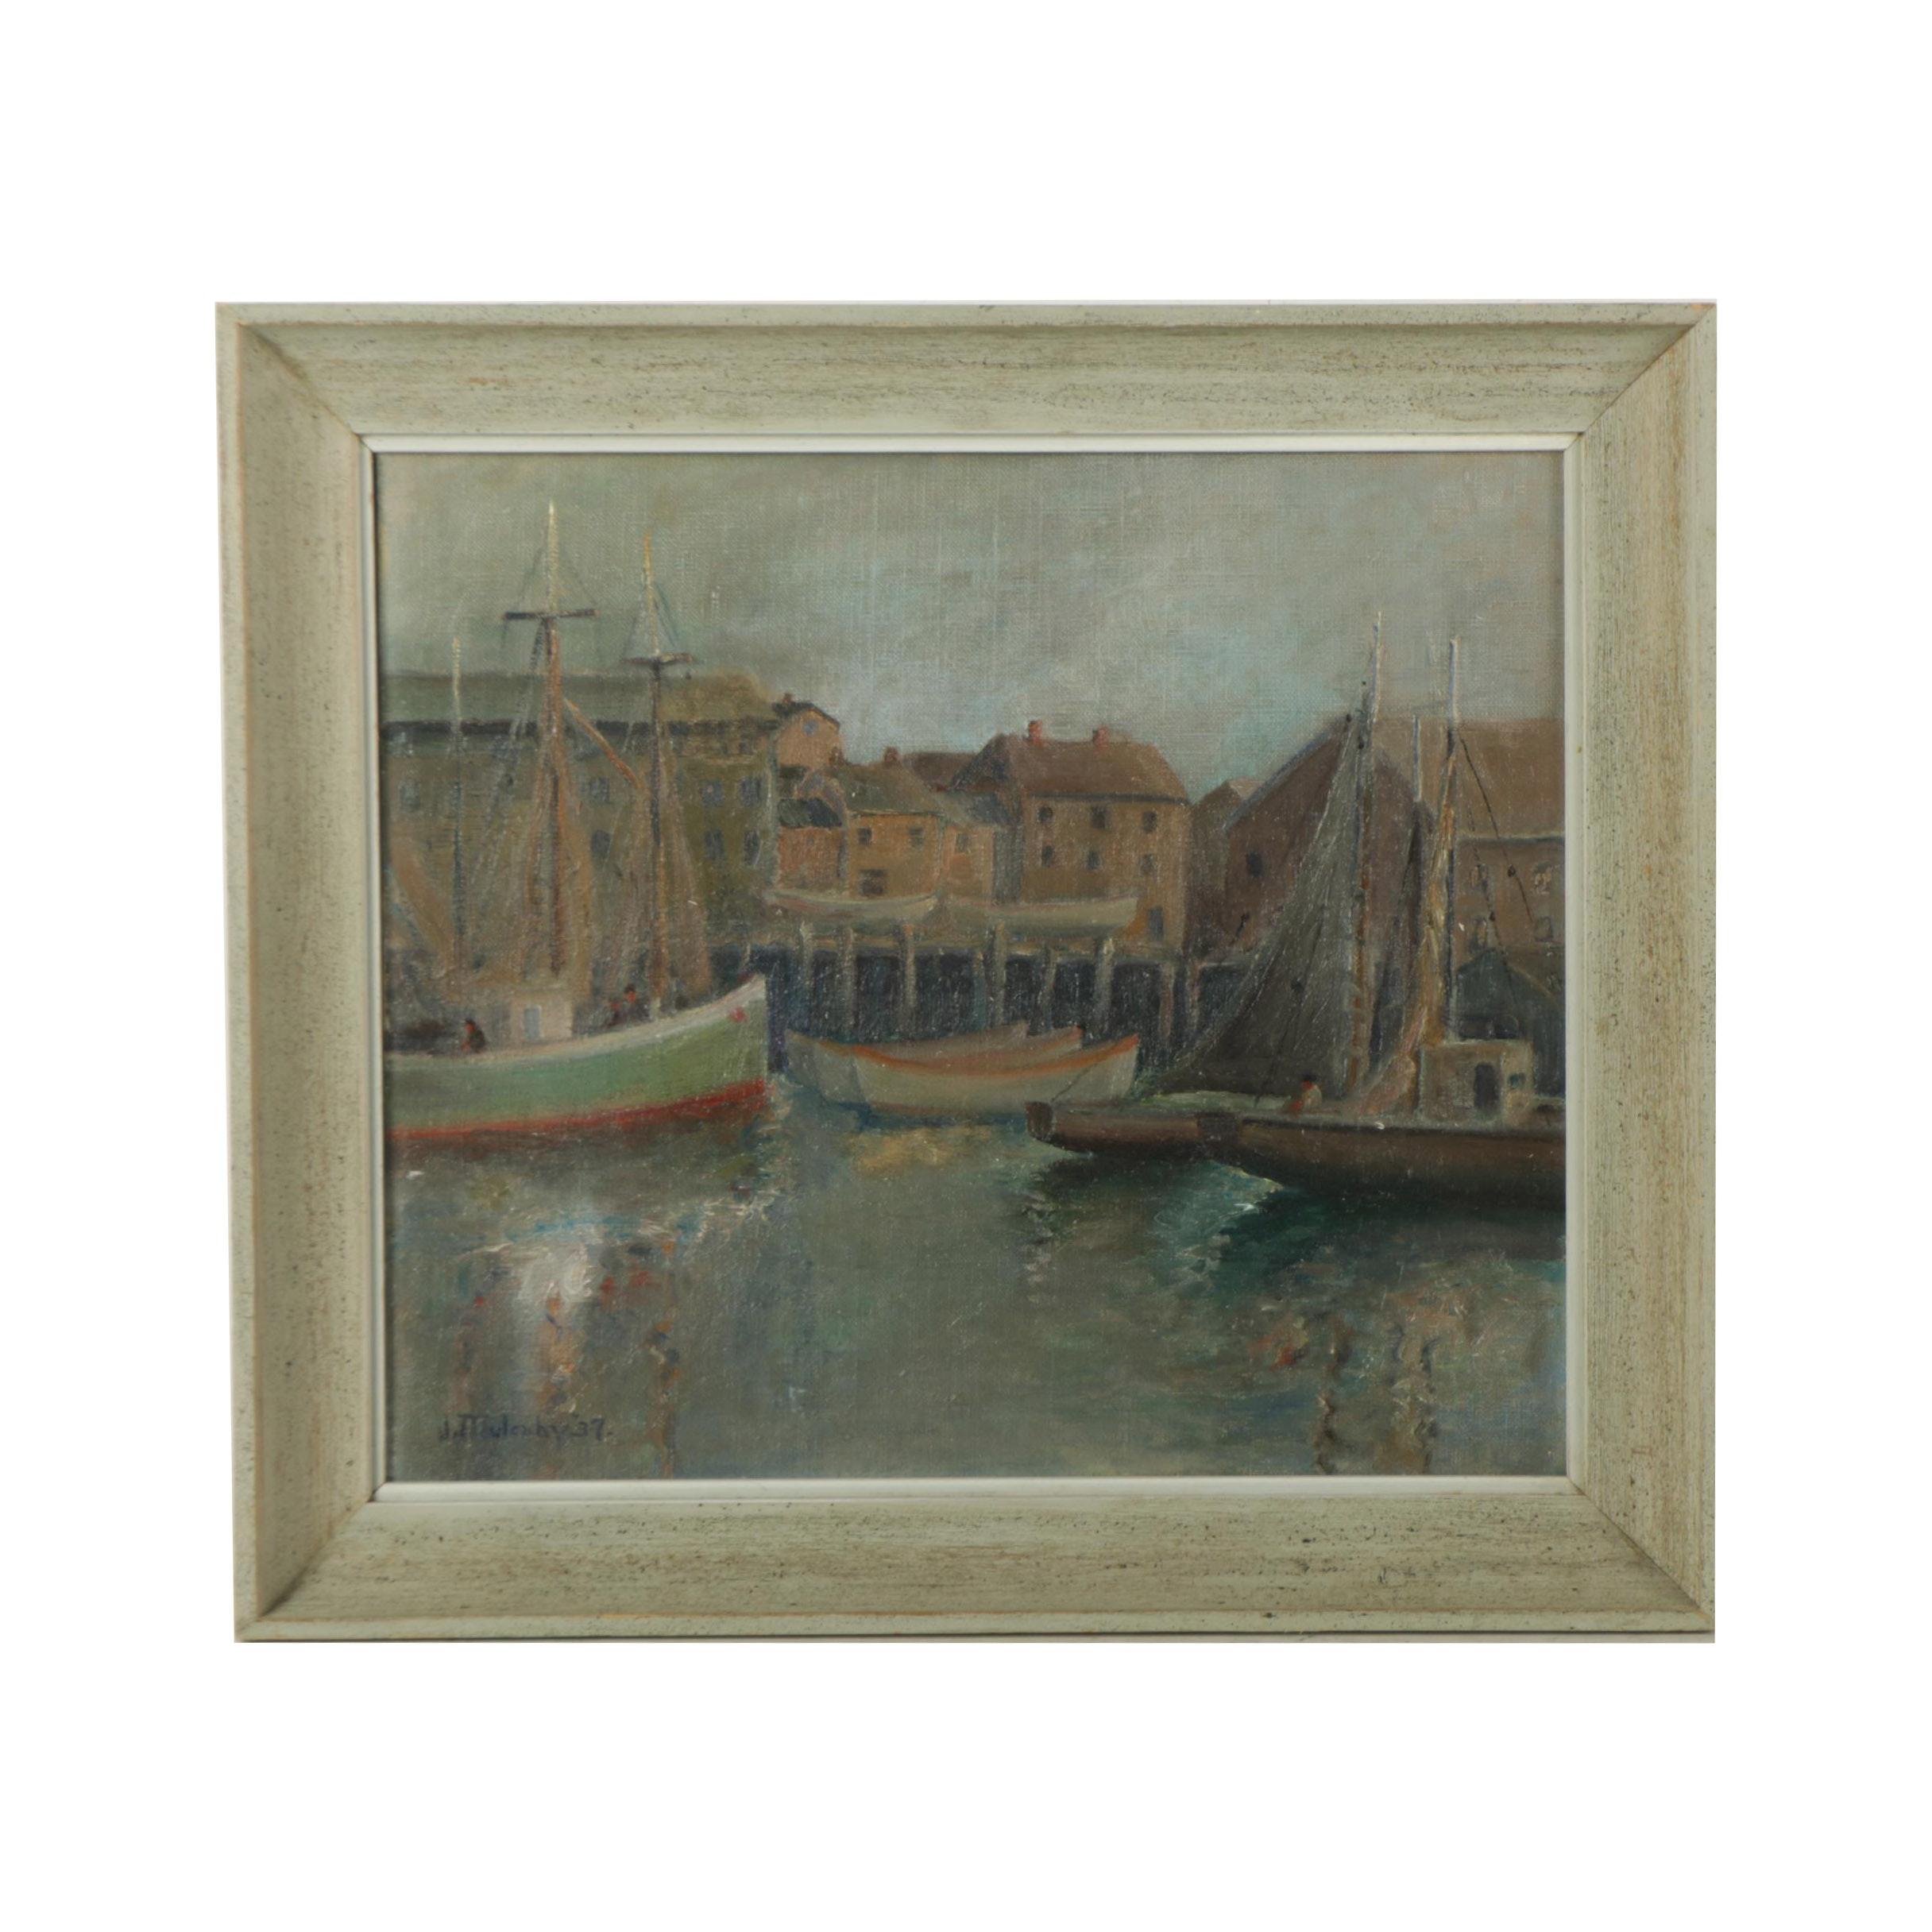 Joseph Mulcahy 1937 Oil Painting on Canvas